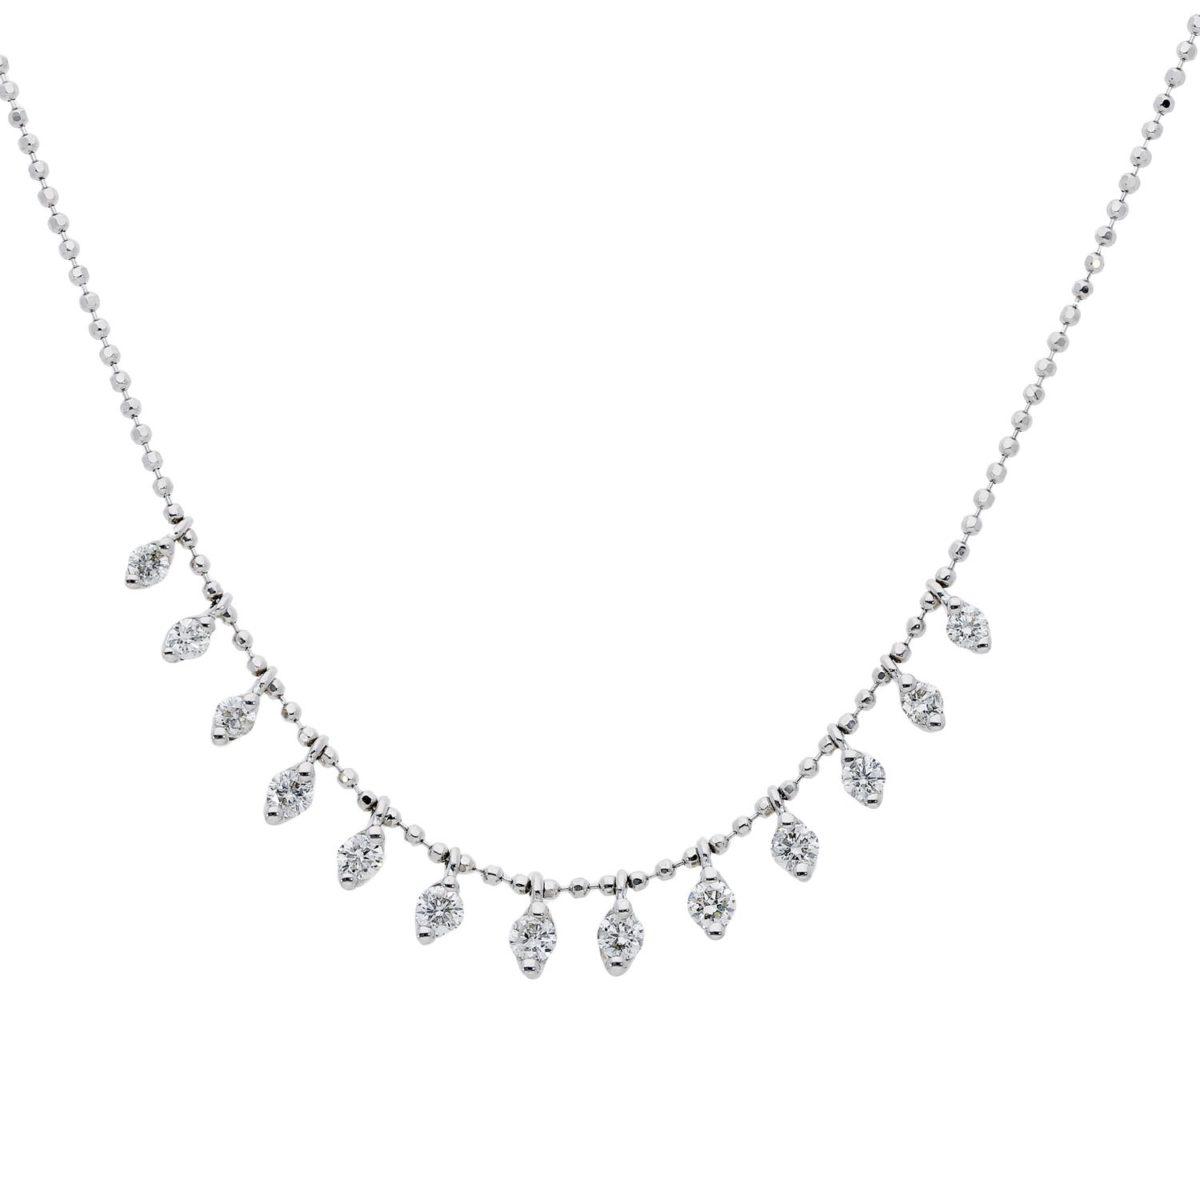 Diamond NecklaceStyle #: ROY-WP8894D